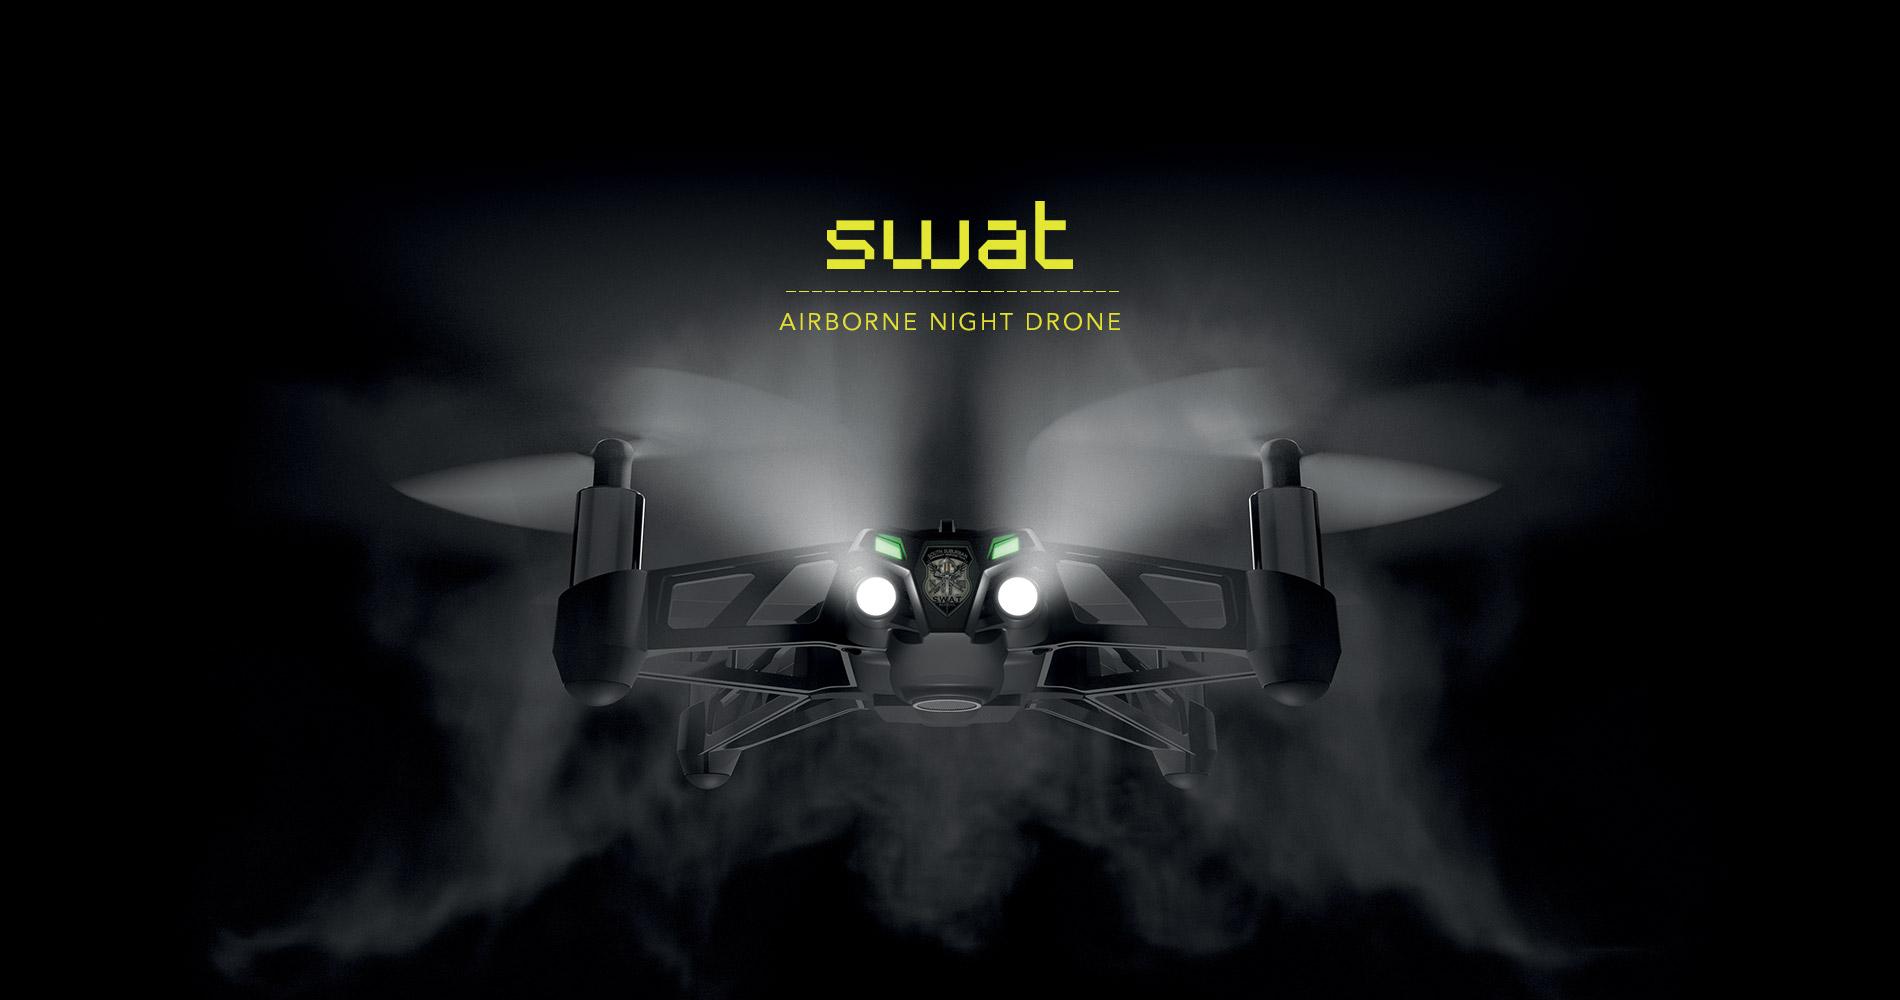 Parrot Airborne Night Drone Swat en droneprix.es